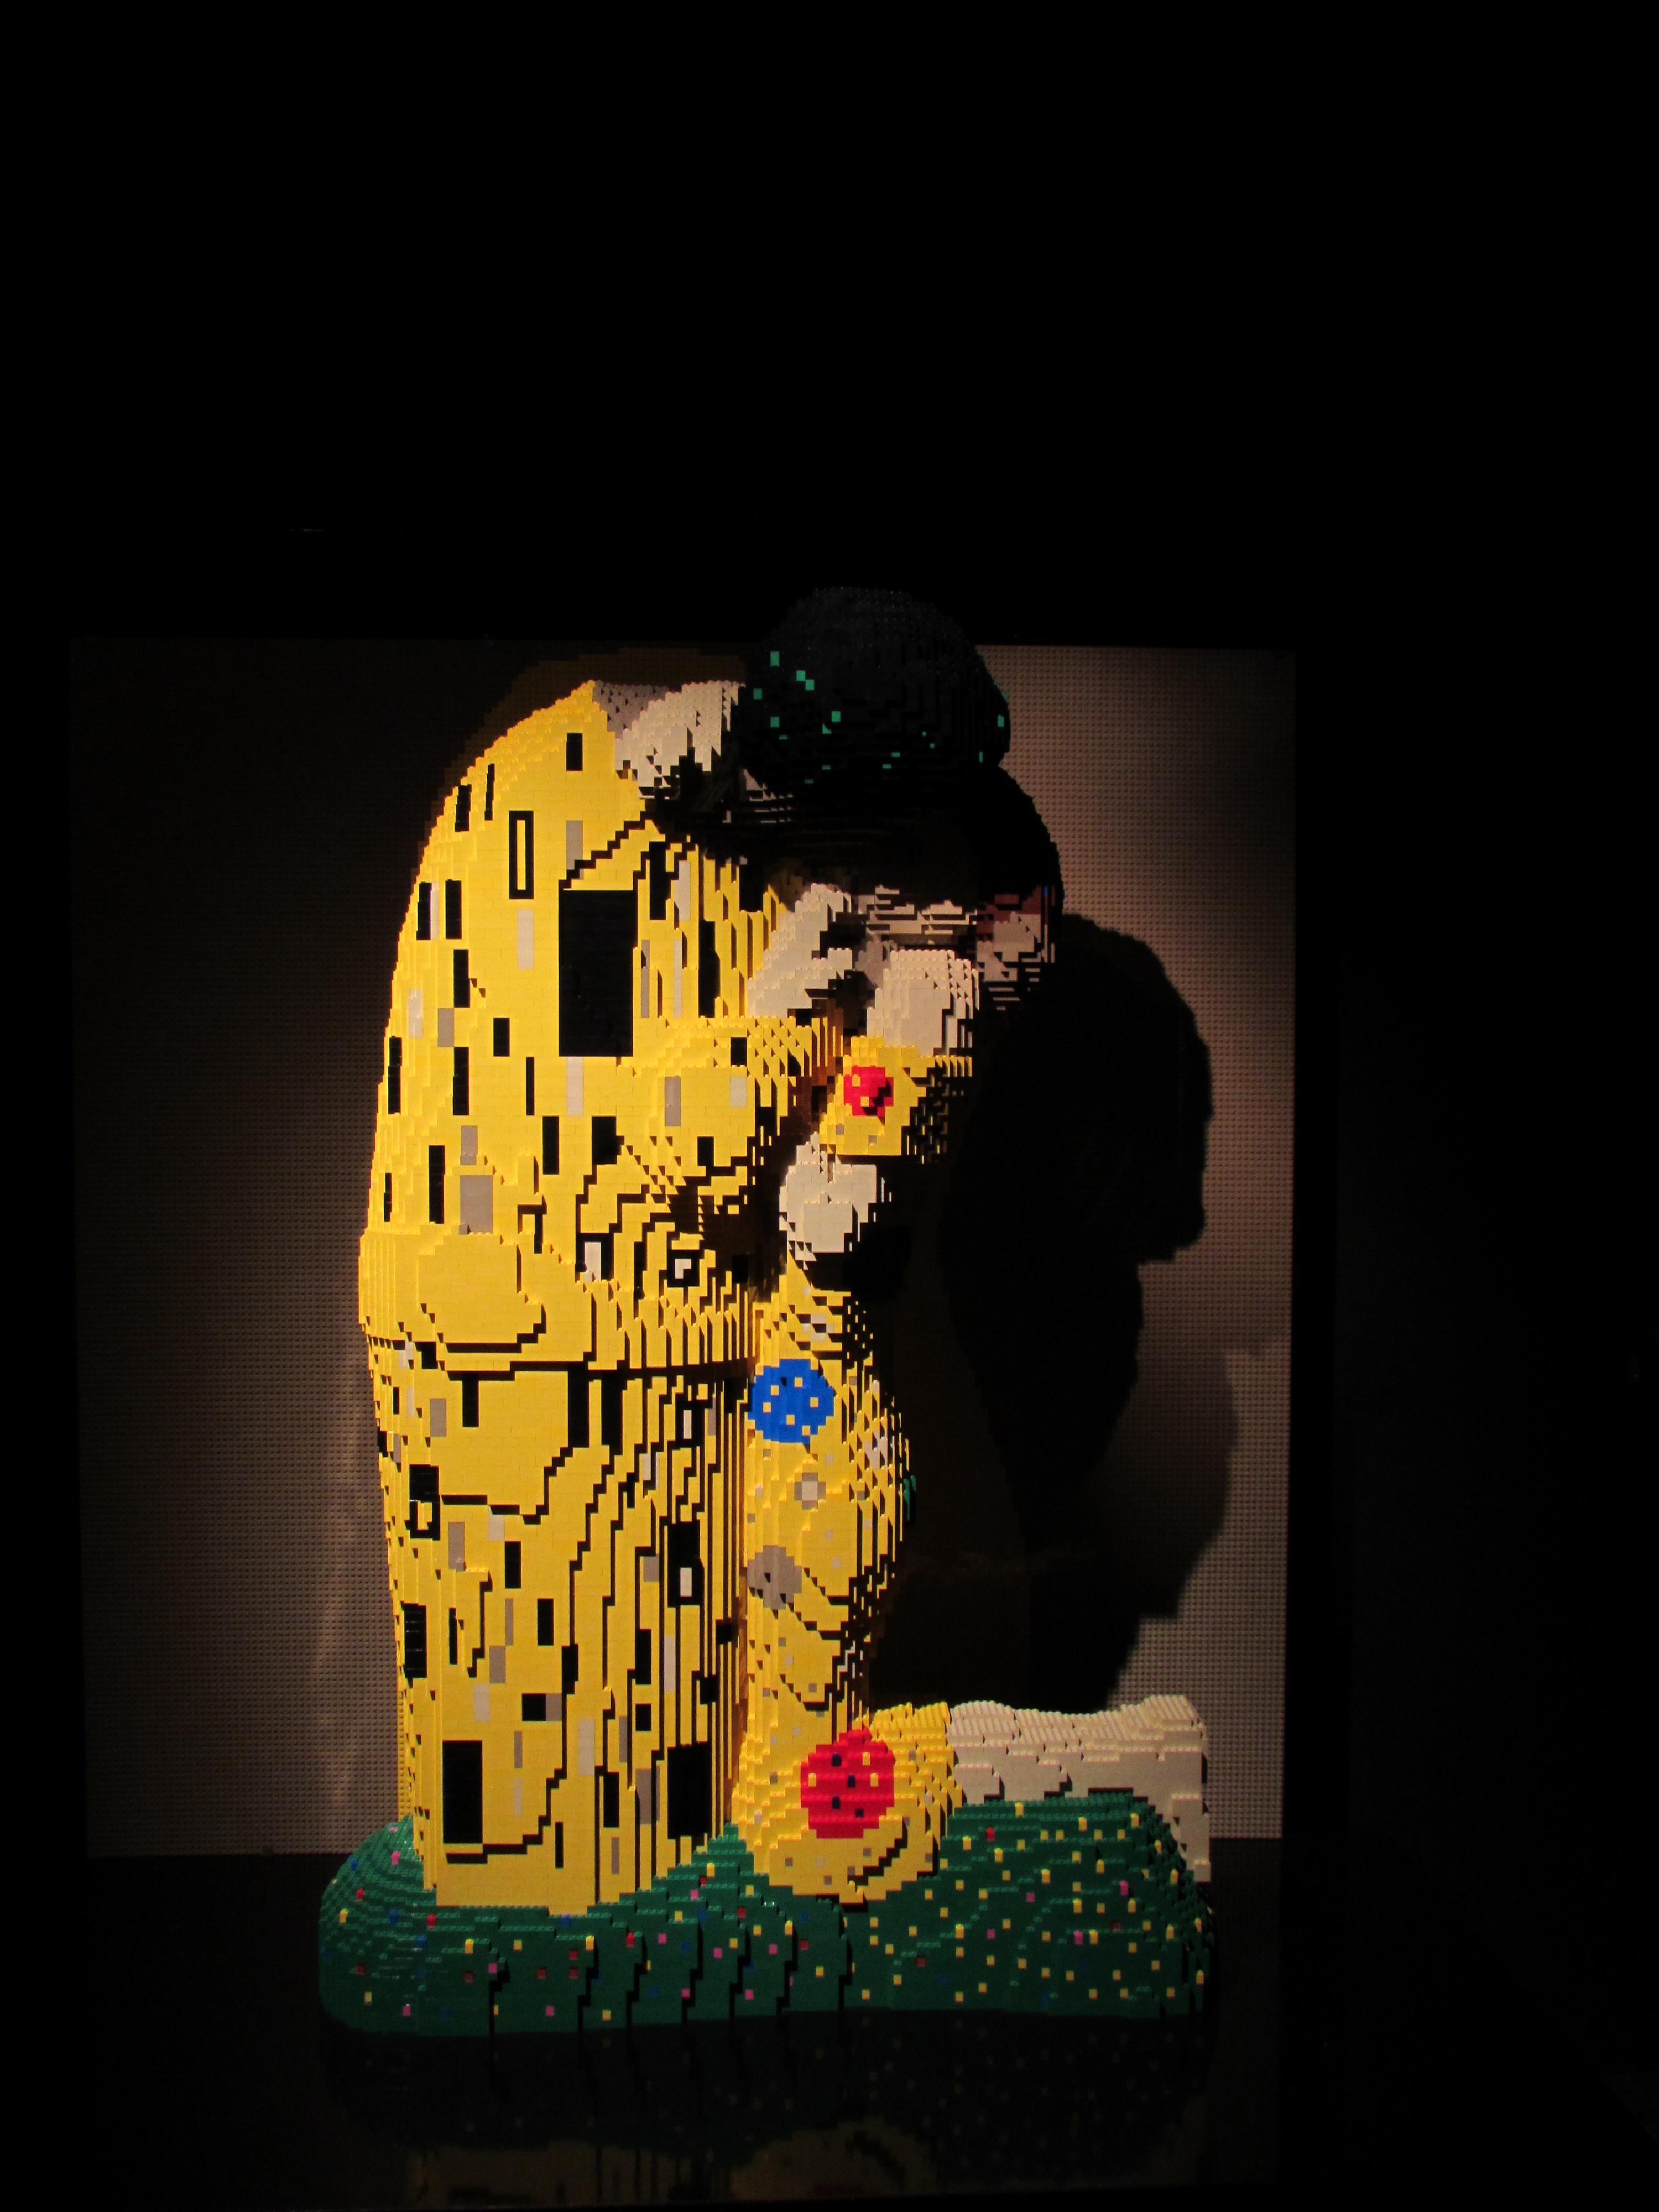 Klimt Der Kuss Wallpaper Gustav Klimt's The Kiss by